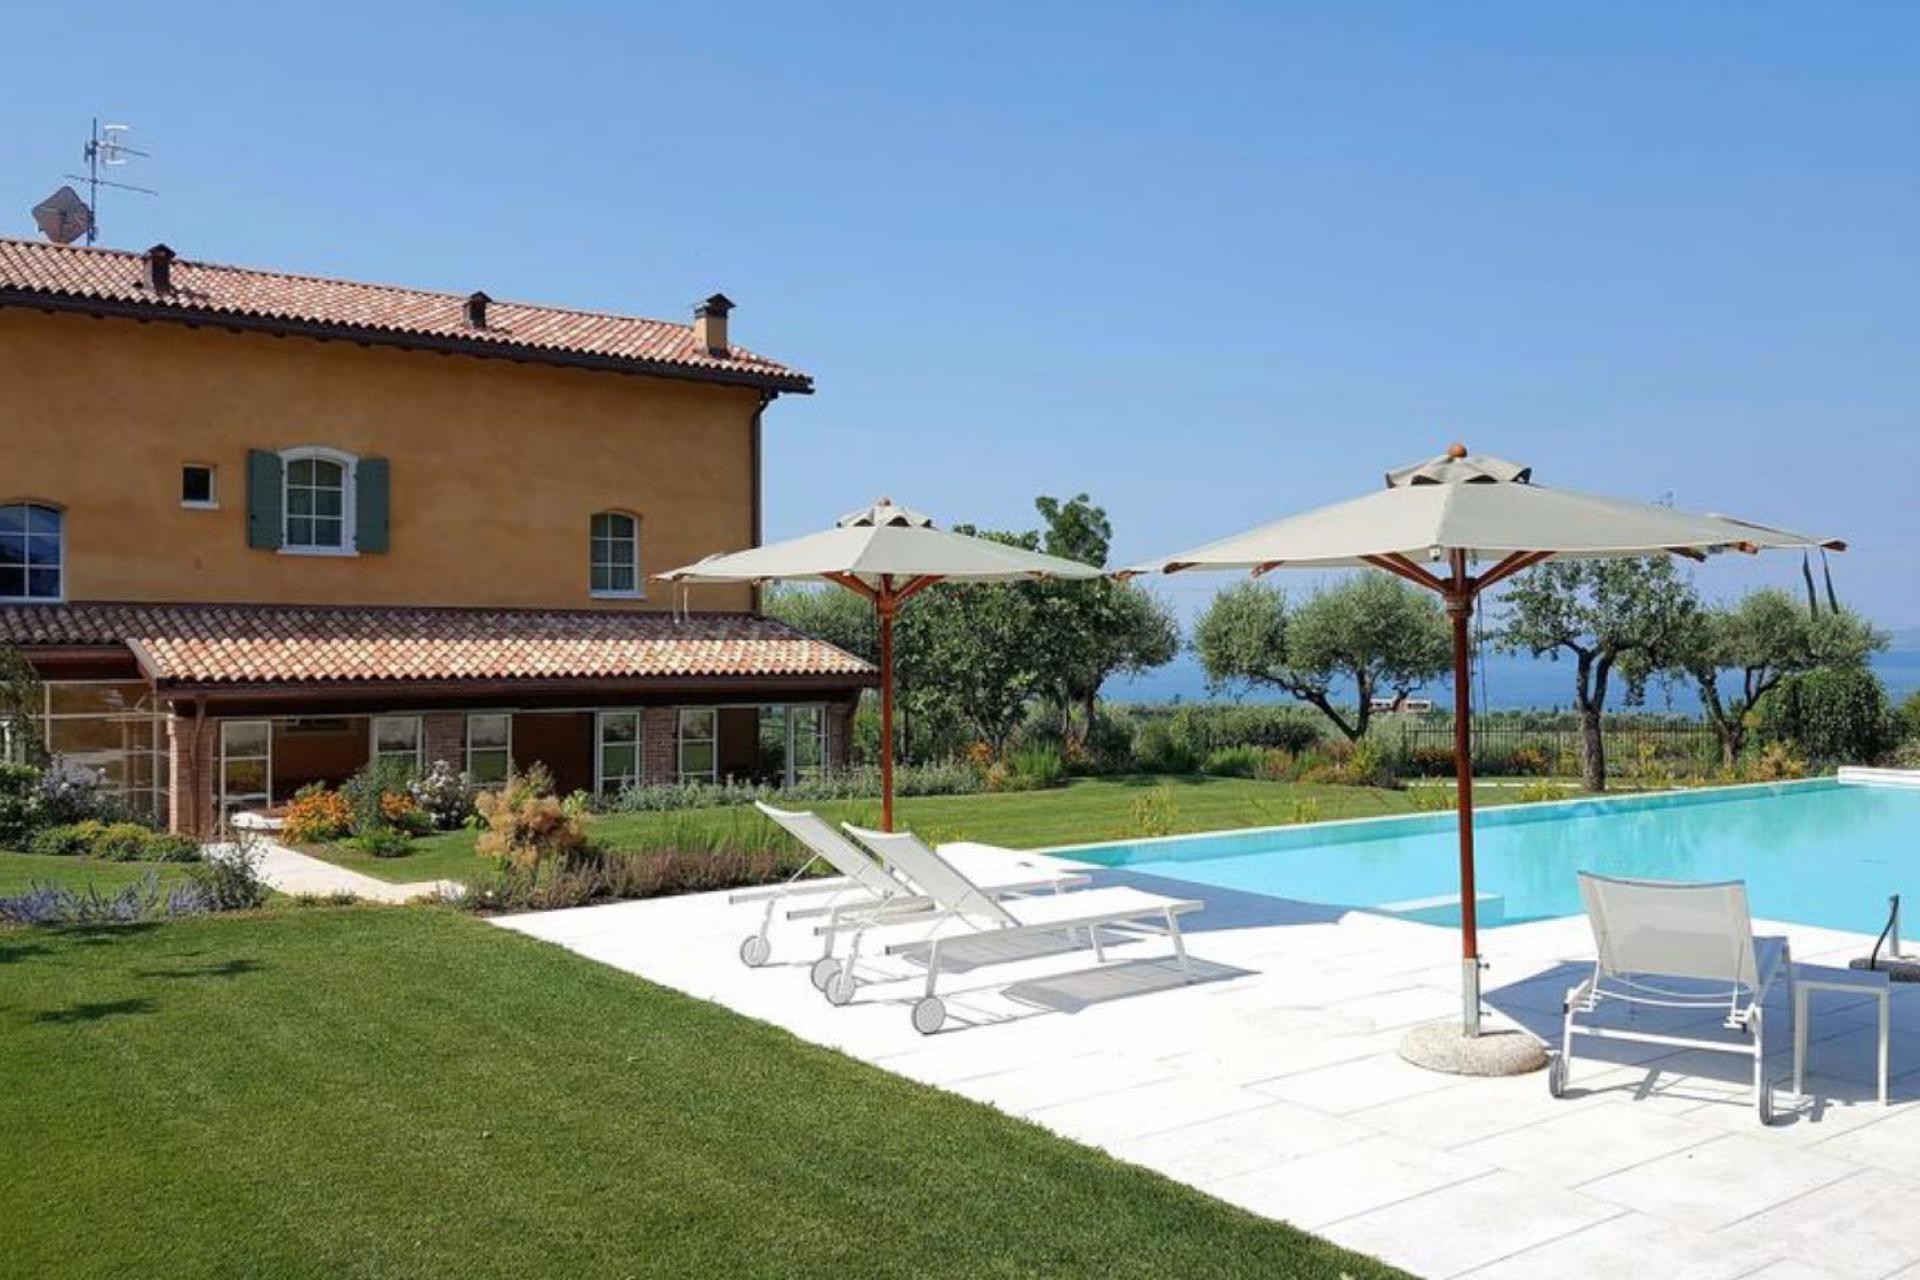 Agriturismo Lake Como and Lake Garda Charming agriturismo with a view of Lake Garda